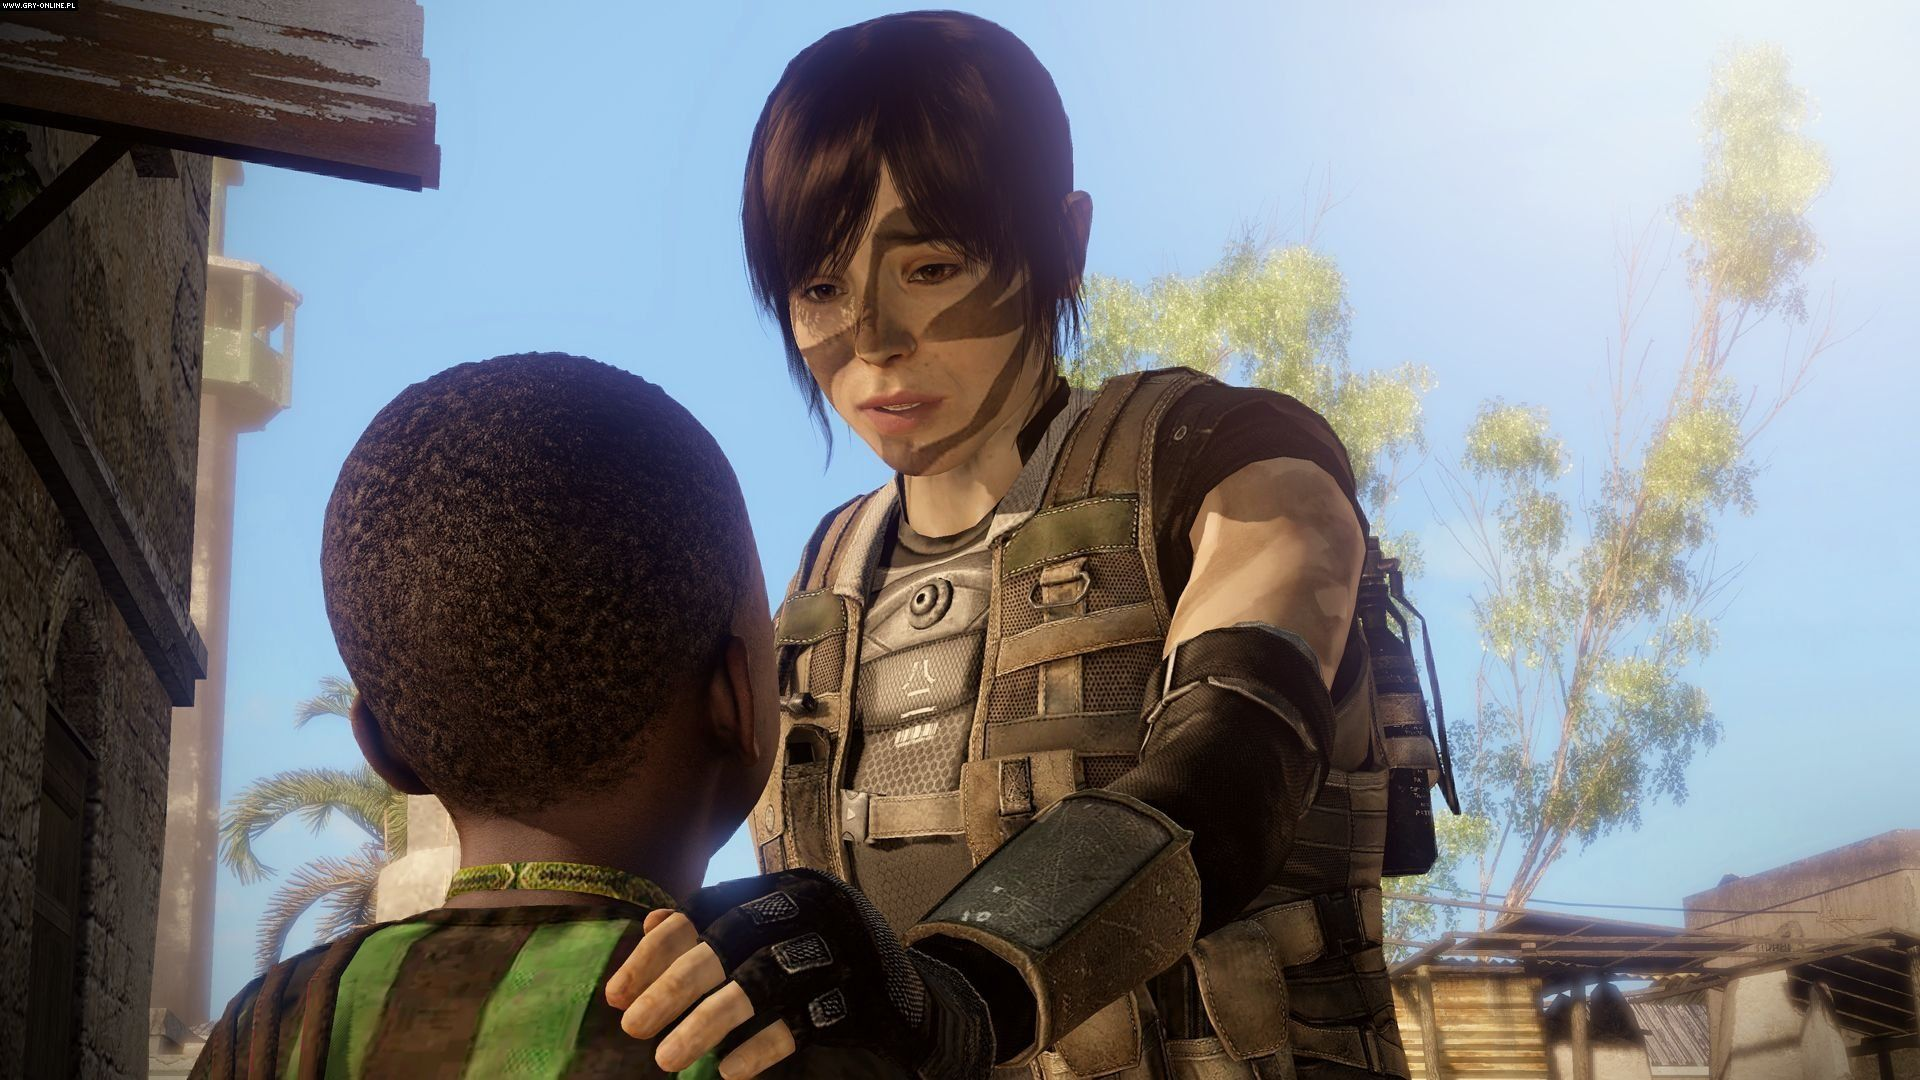 Pin de Evelyn em • Beyond : Two Souls em 2020 | Jogos, Game